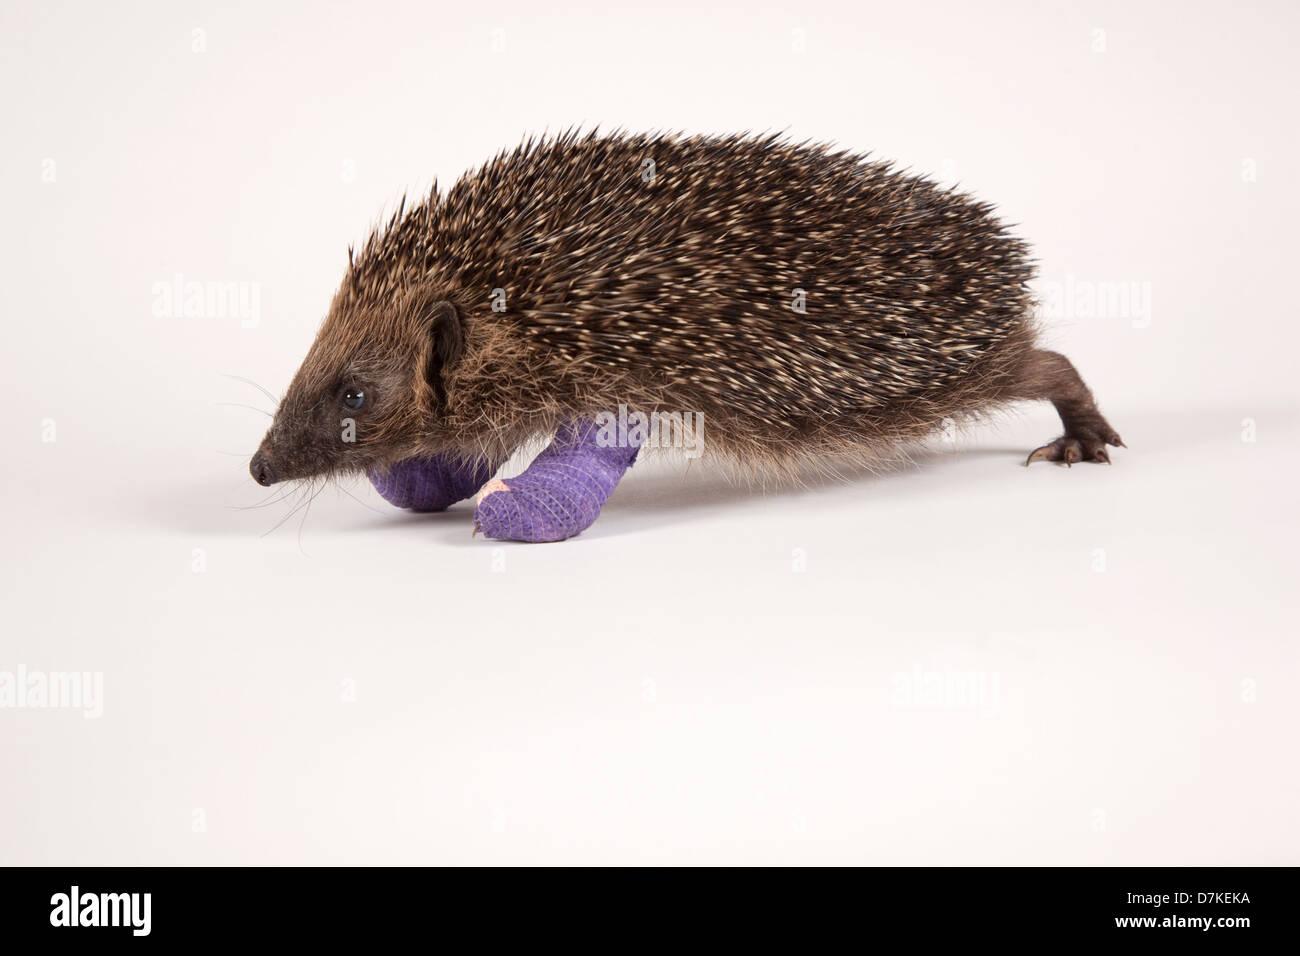 European Hedgehog with broken leg - Stock Image